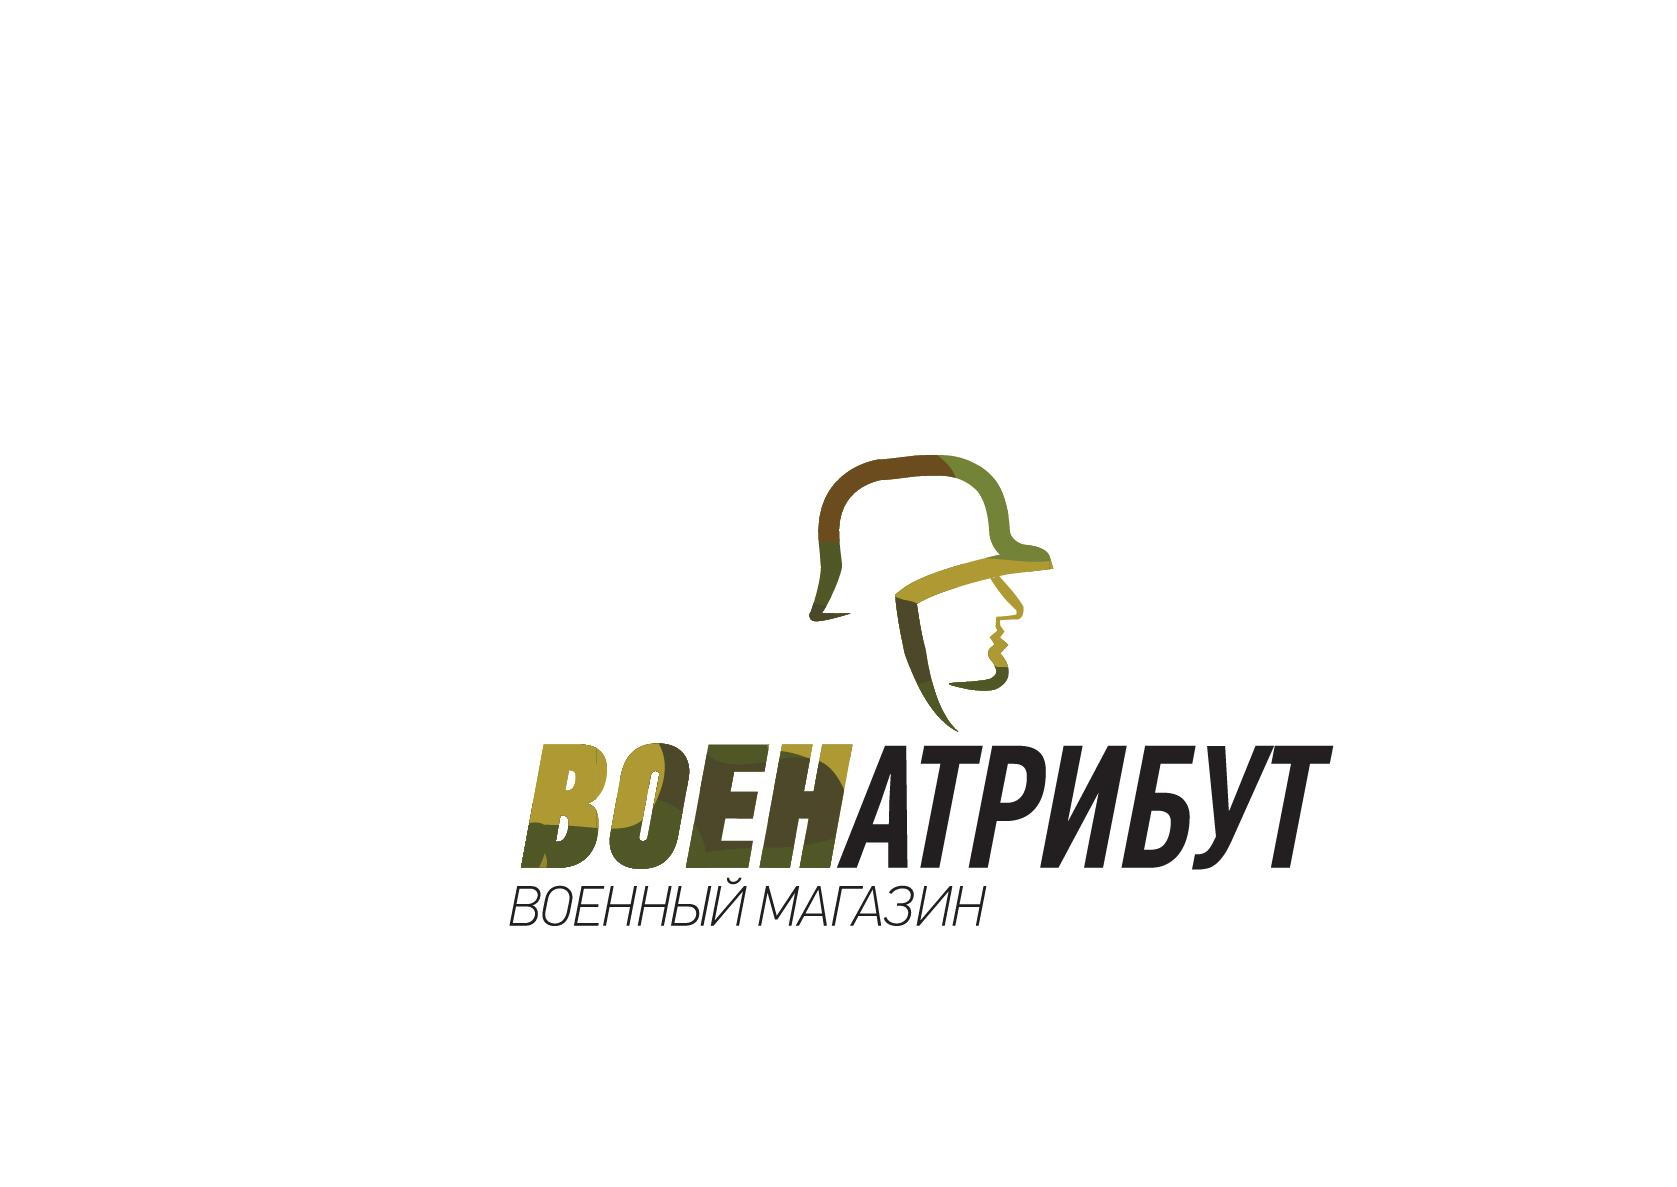 Разработка логотипа для компании военной тематики фото f_861601d747322bc0.jpg